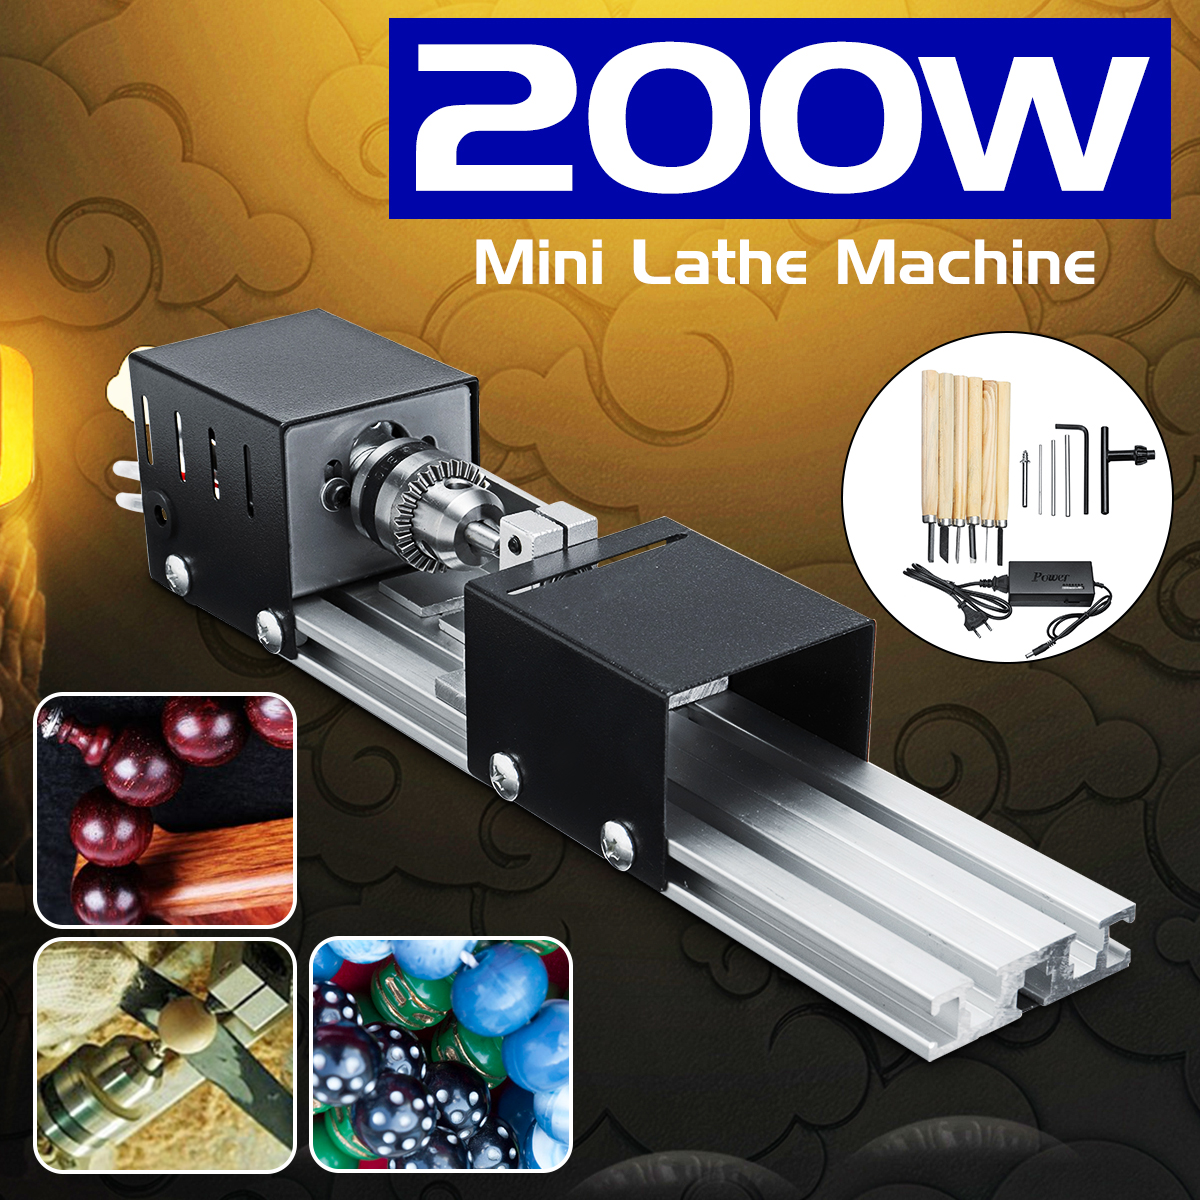 150W 110V Mini Lathe Beads Polisher Machine Wood Woodworking Rotary DIY Set US